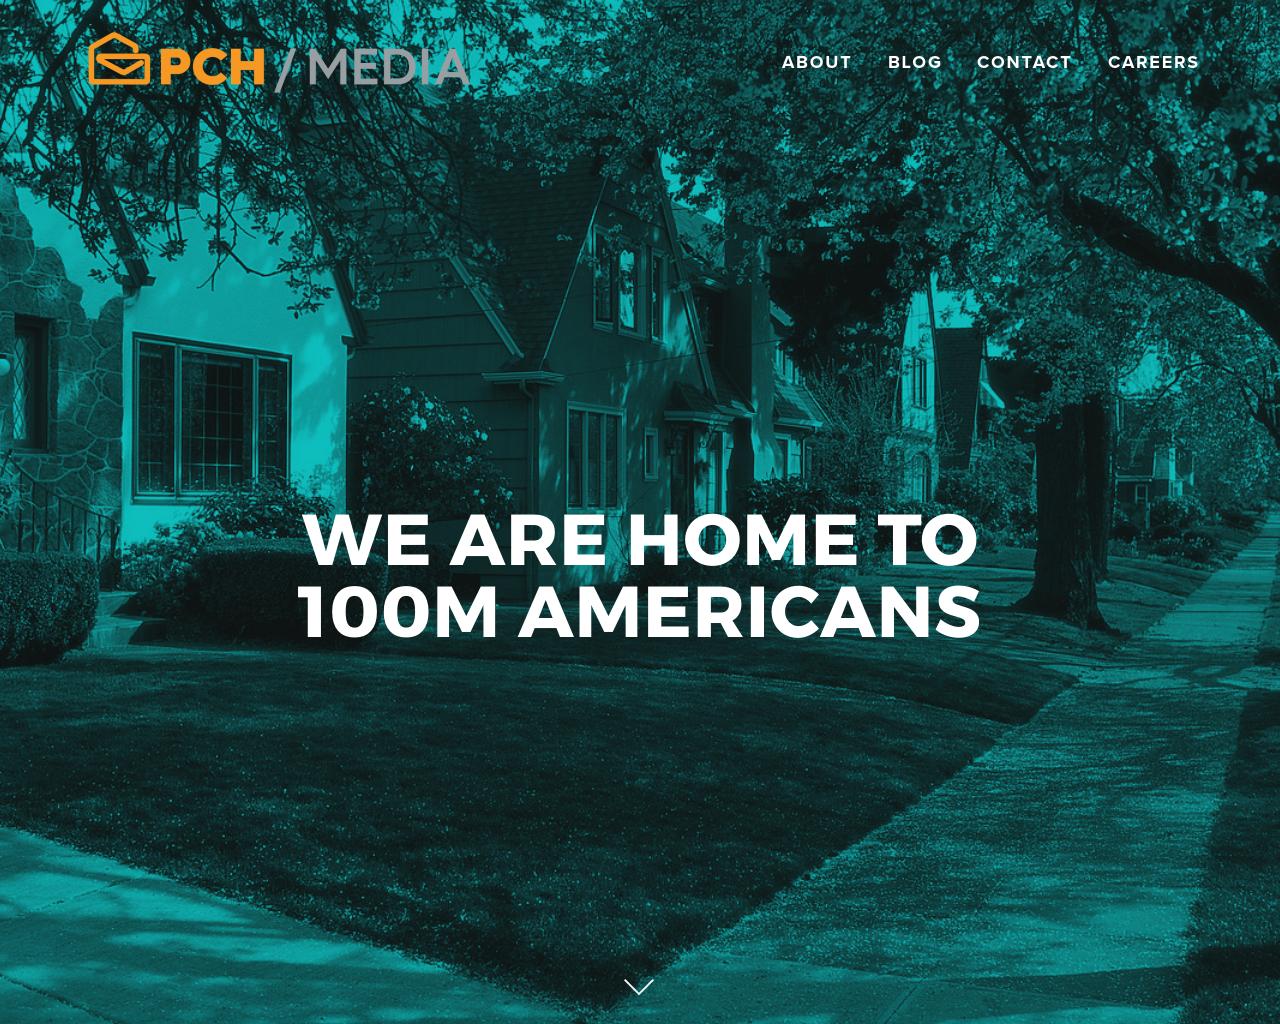 PCH-Digital-Advertising-Reviews-Pricing